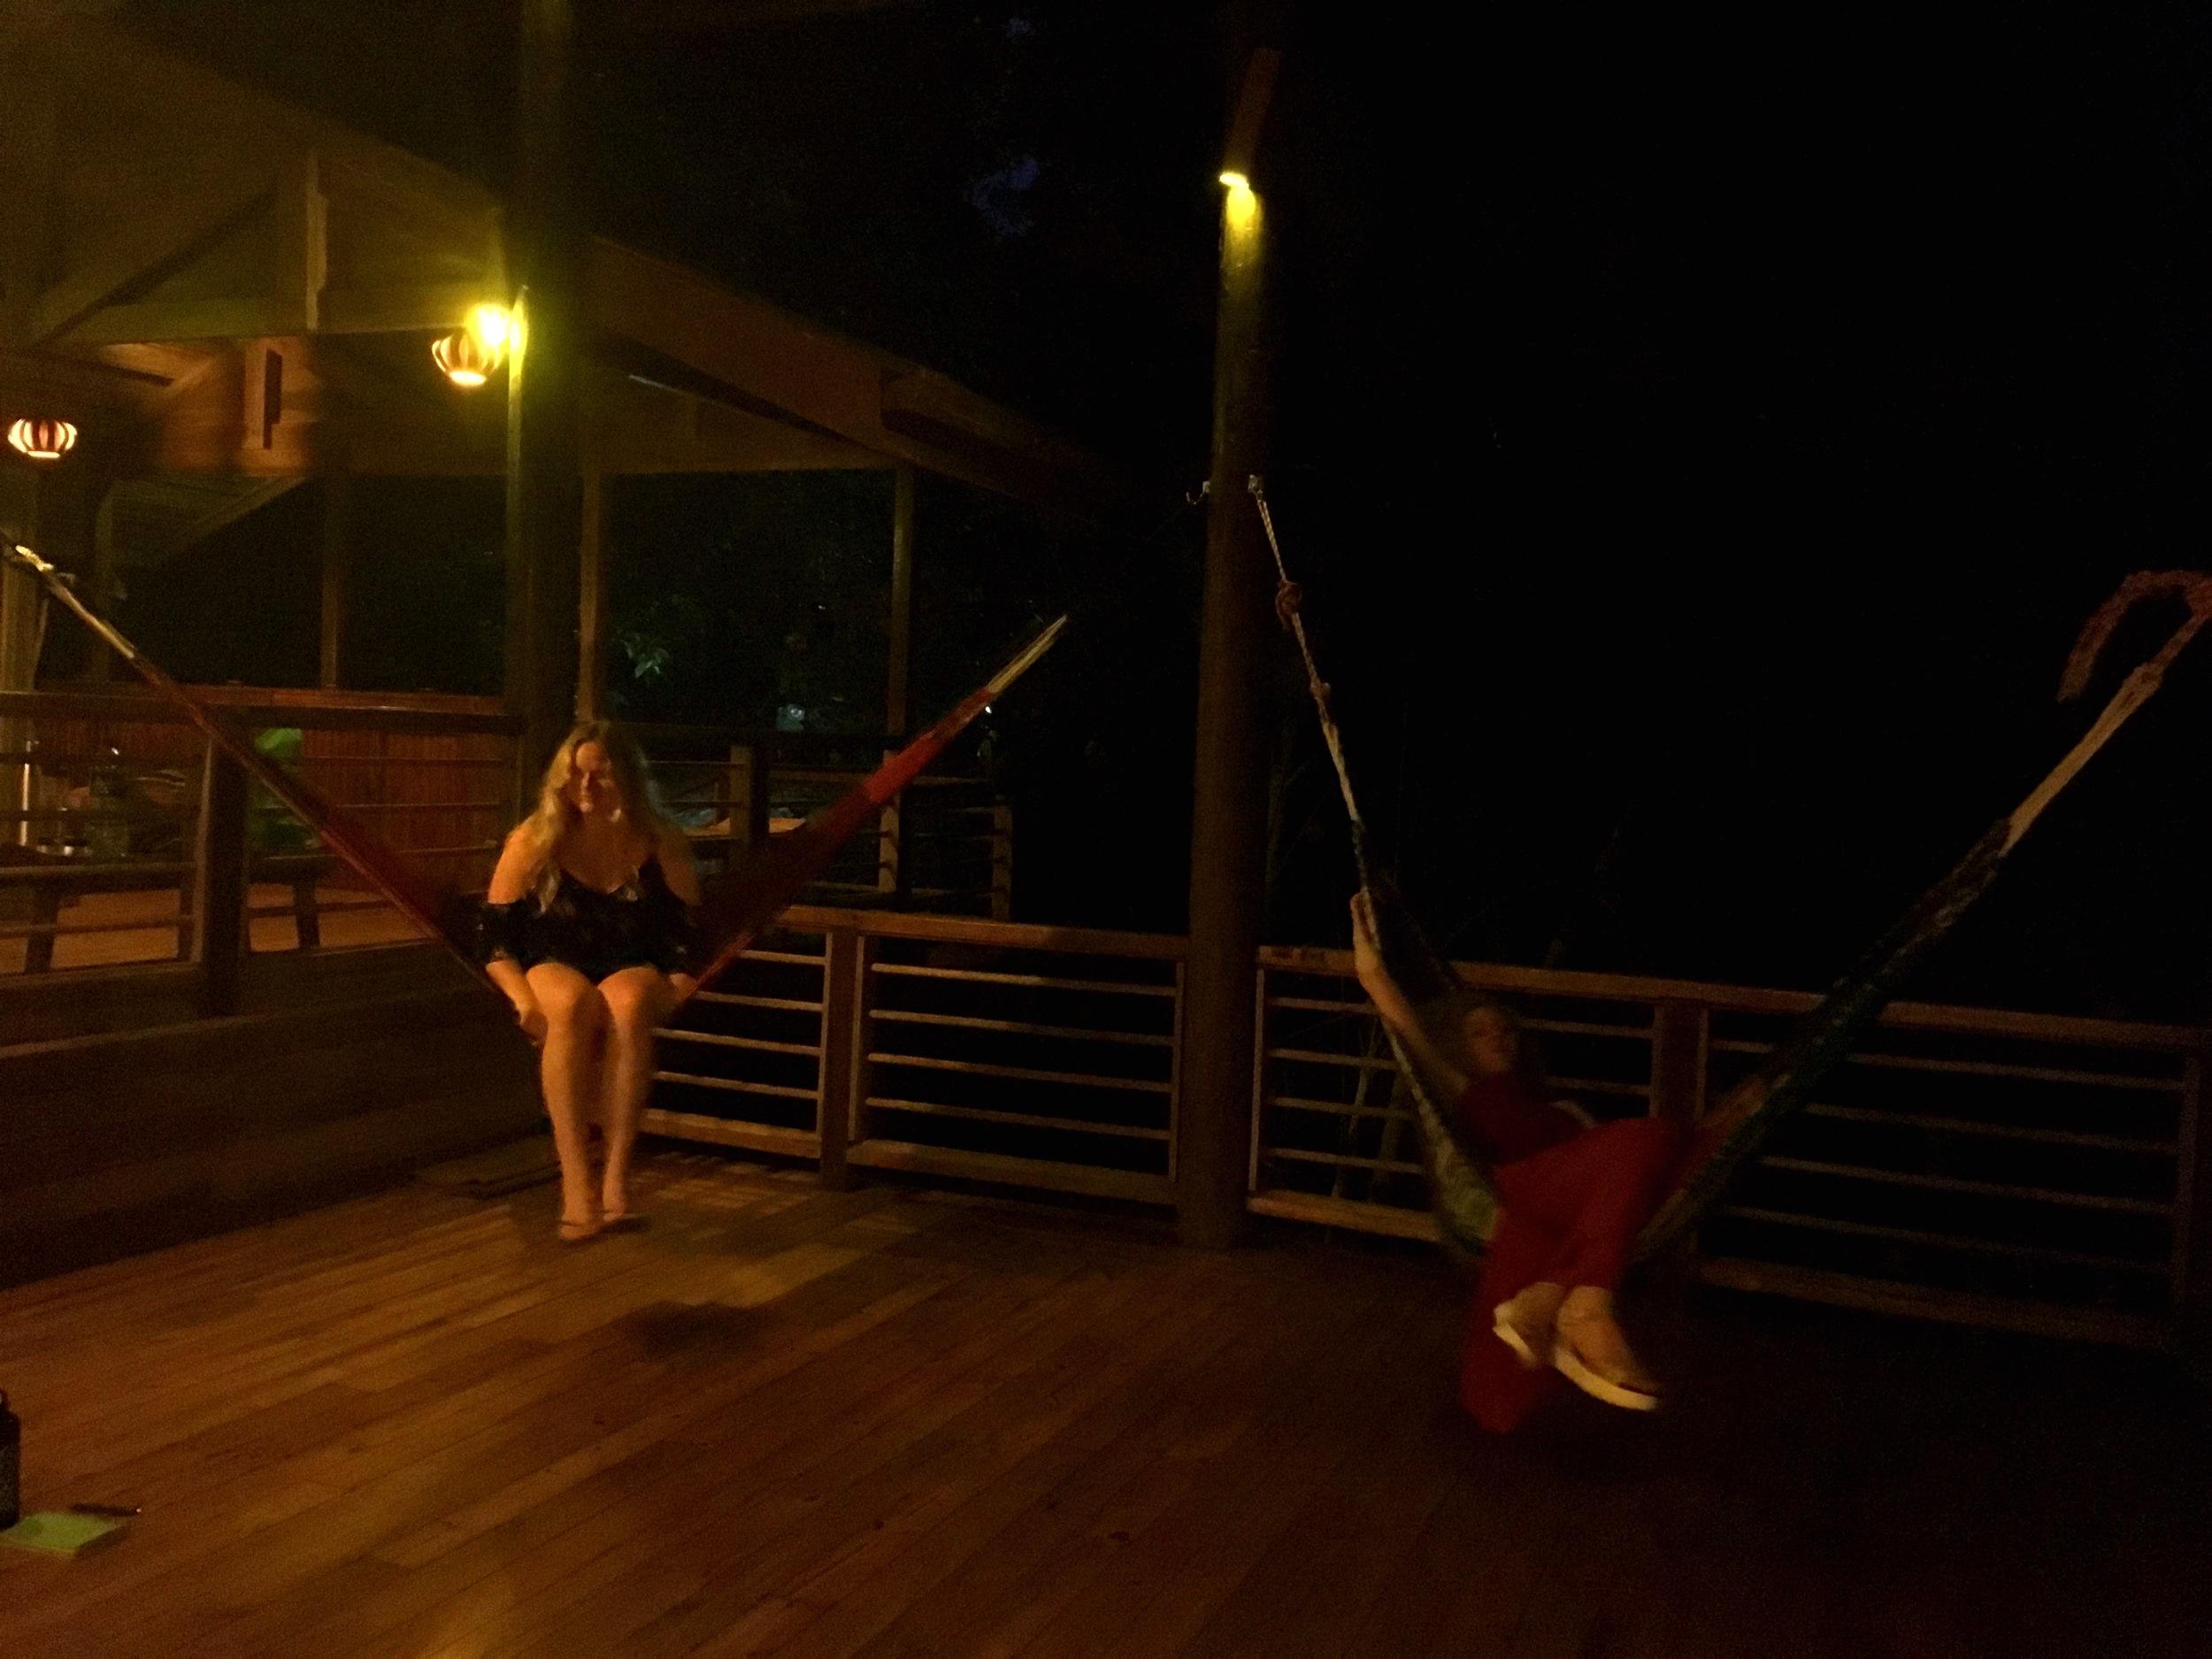 EVENING LOUNGING IN COSTA RICA